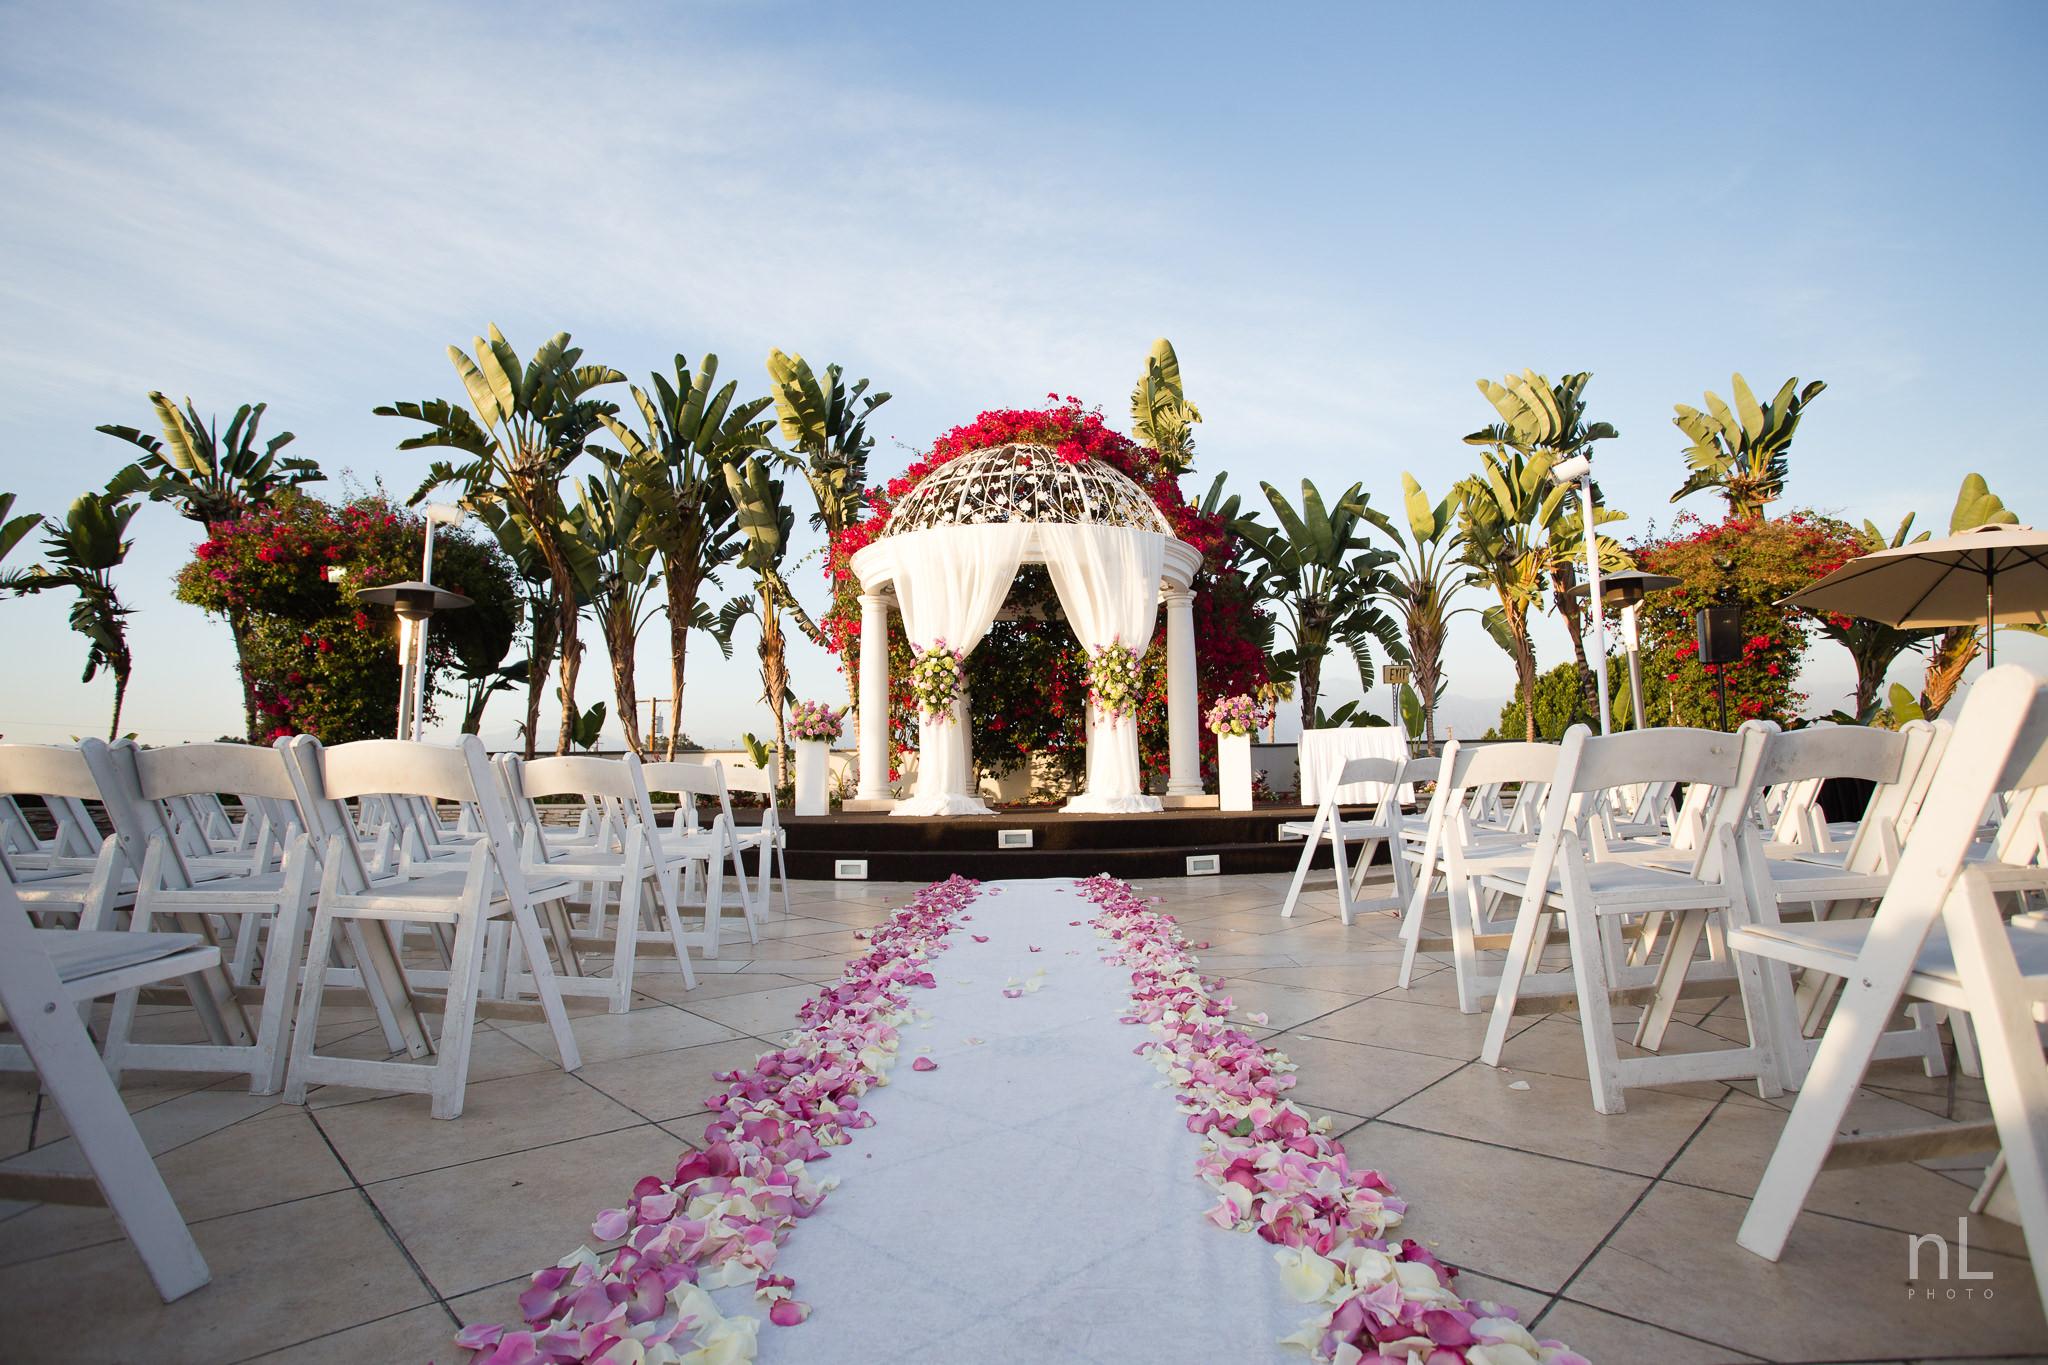 nick-lie-photography-los-angeles-wedding-photographer-21.jpg